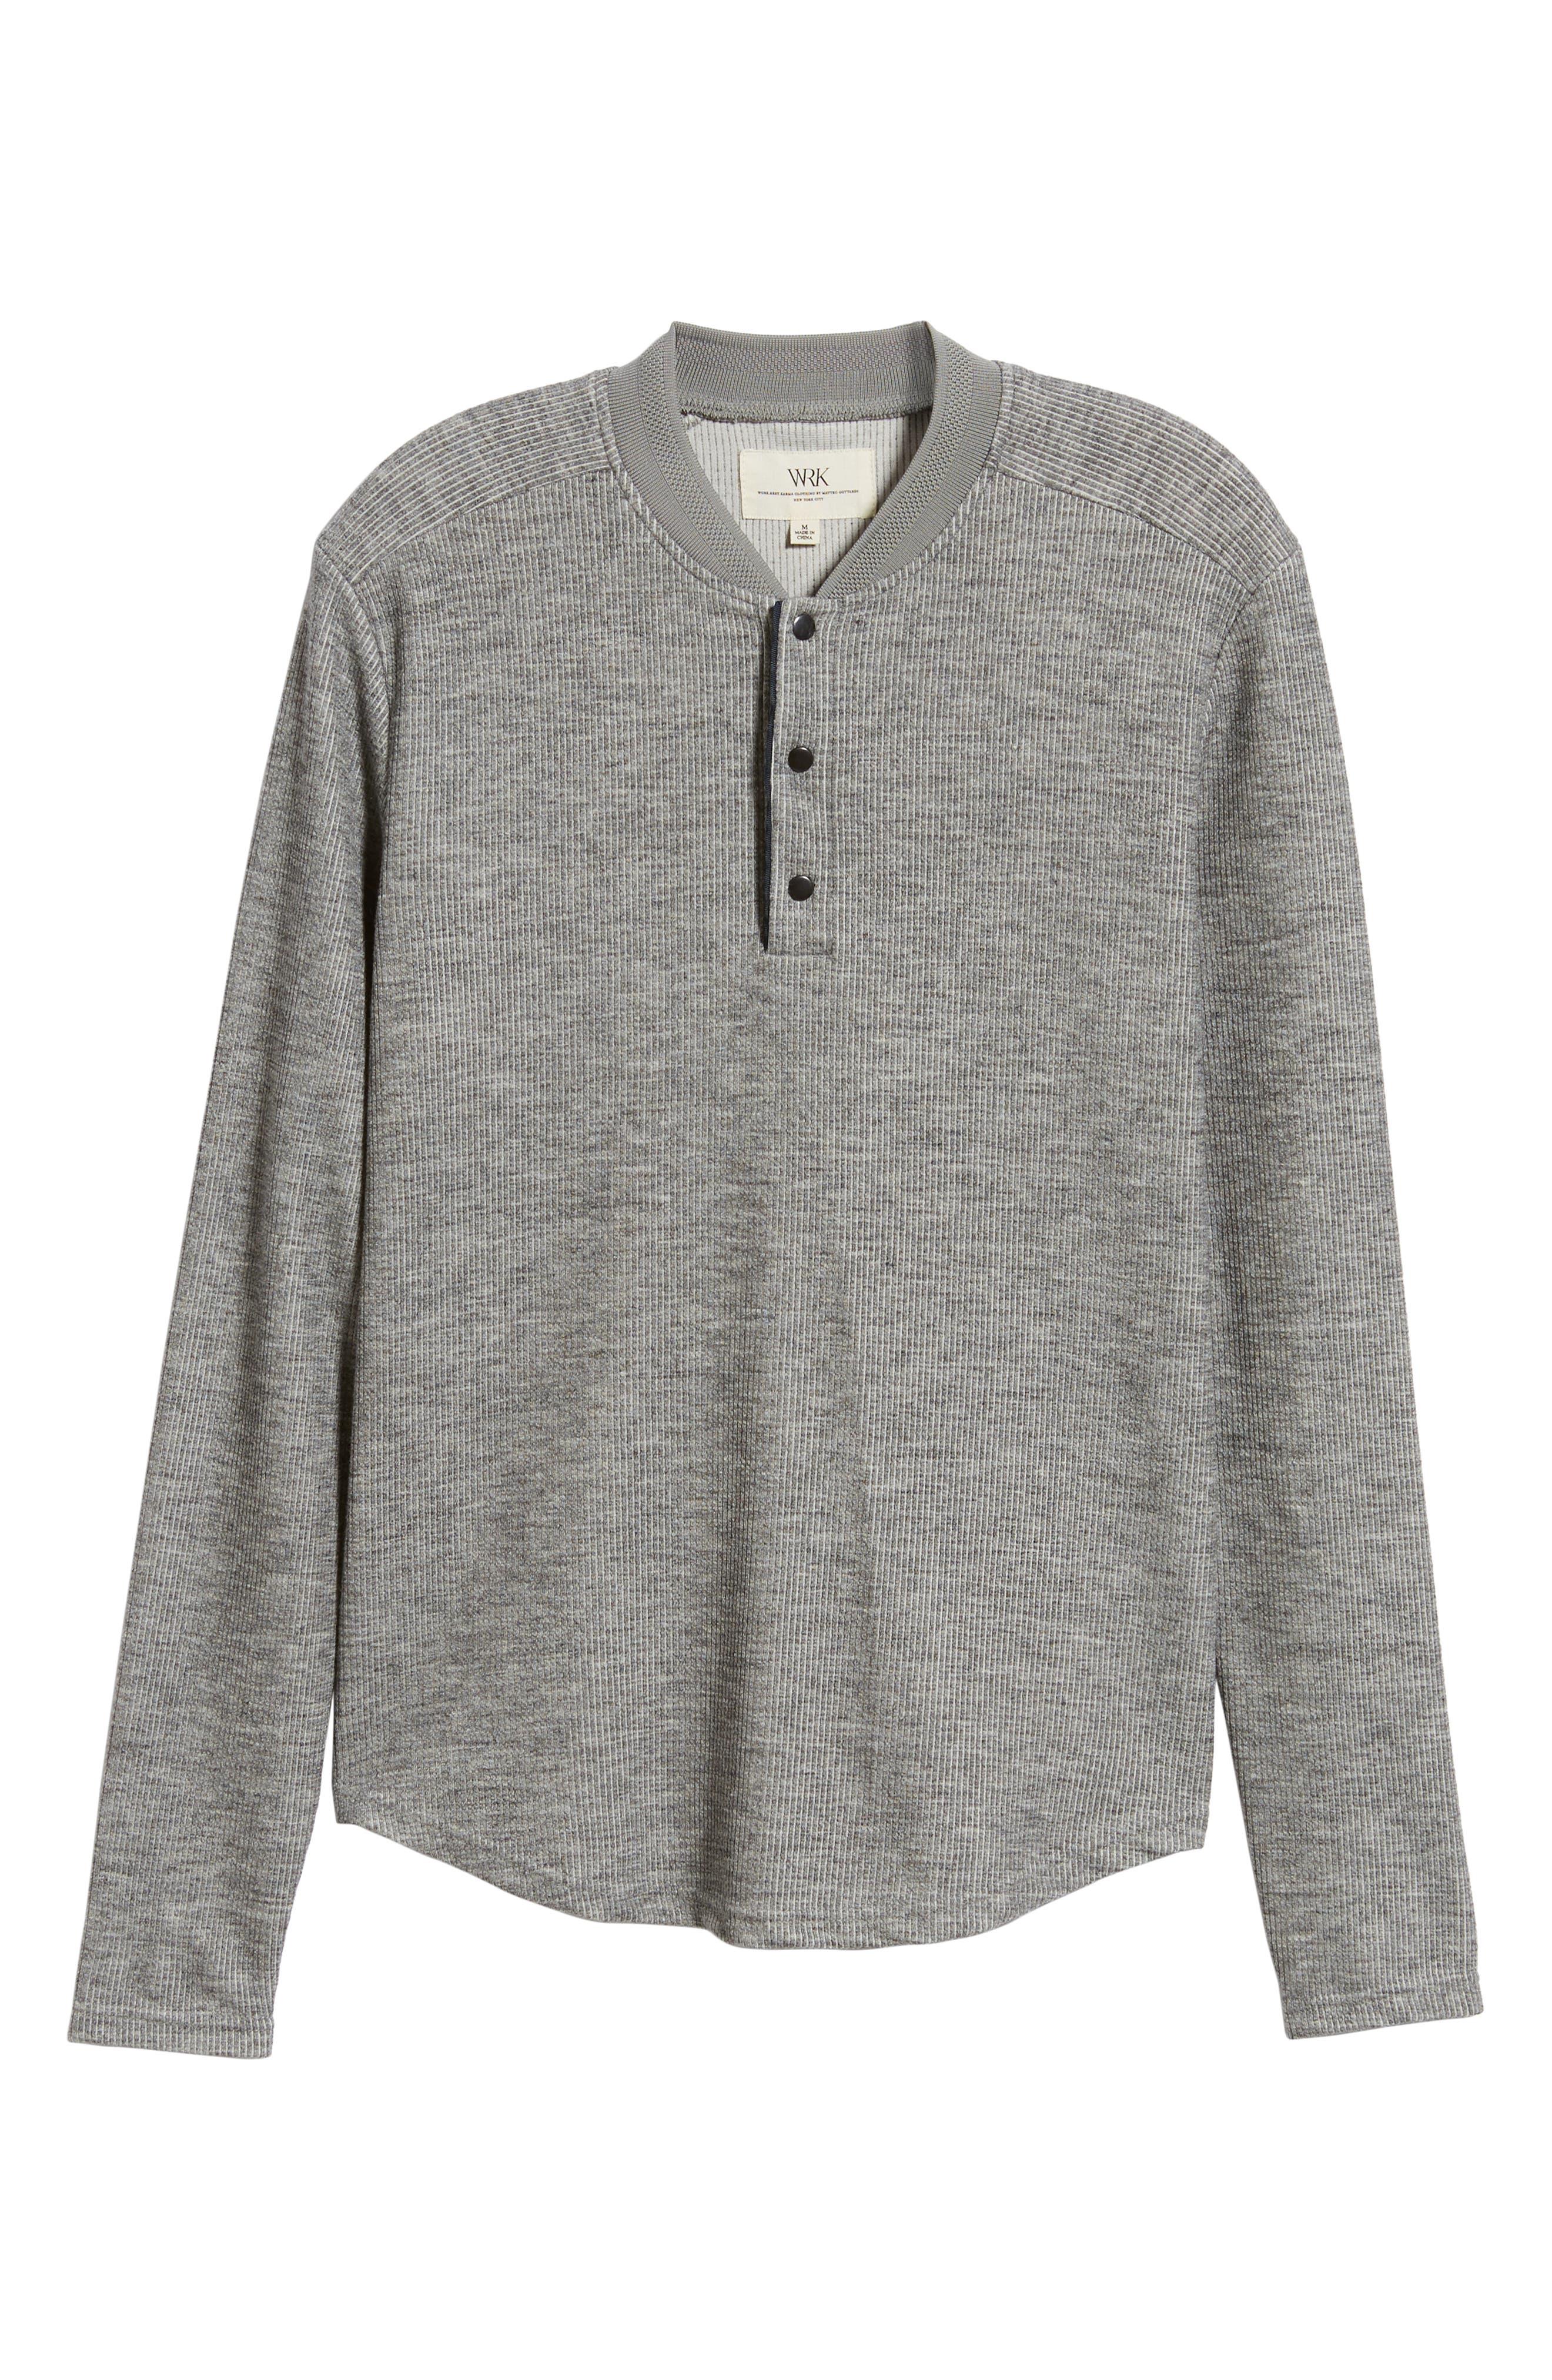 Charlie Rib Knit Henley Shirt,                             Alternate thumbnail 6, color,                             GREY